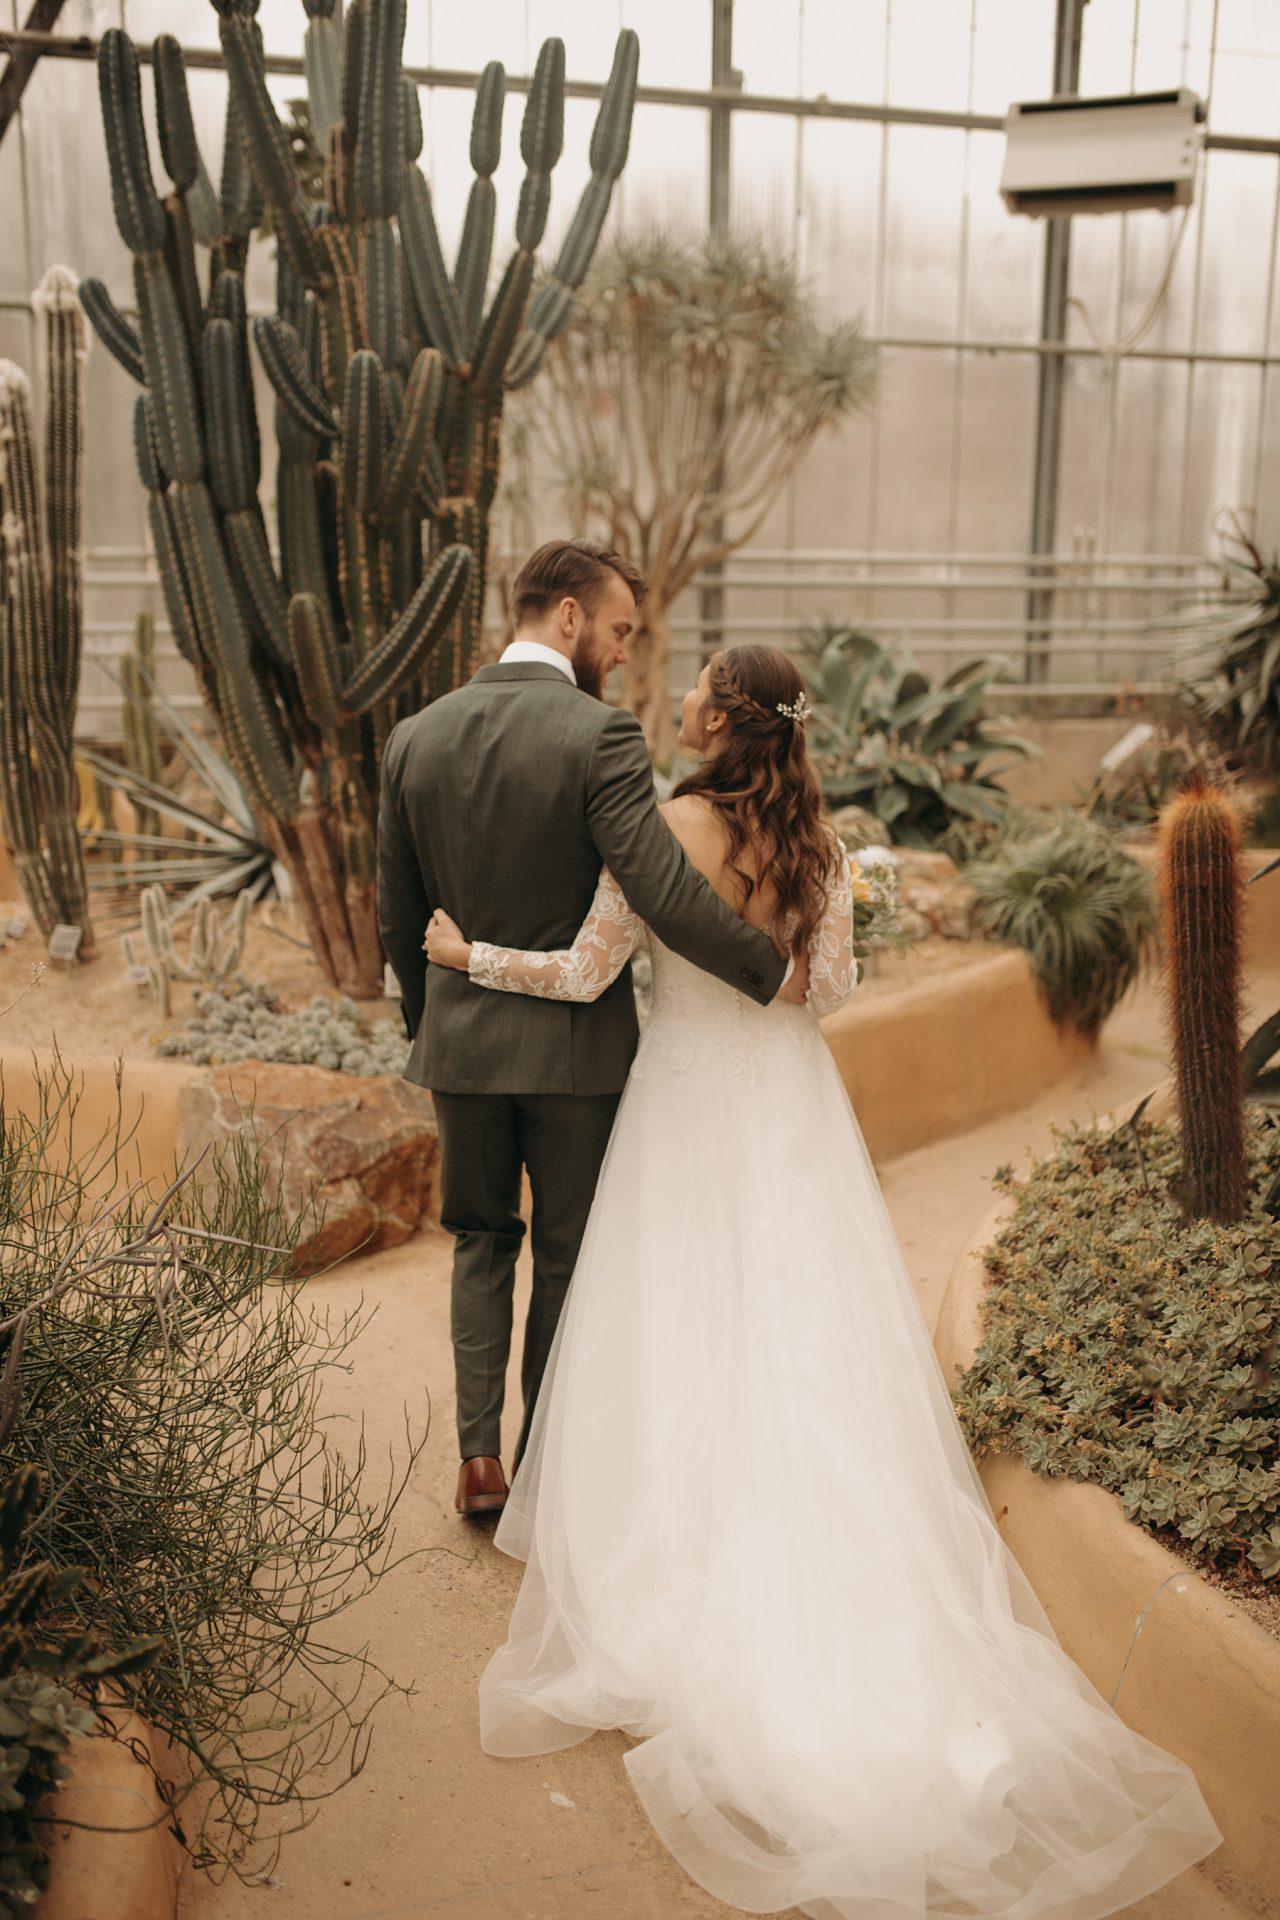 wedding-photographer-amsterdam-jm47